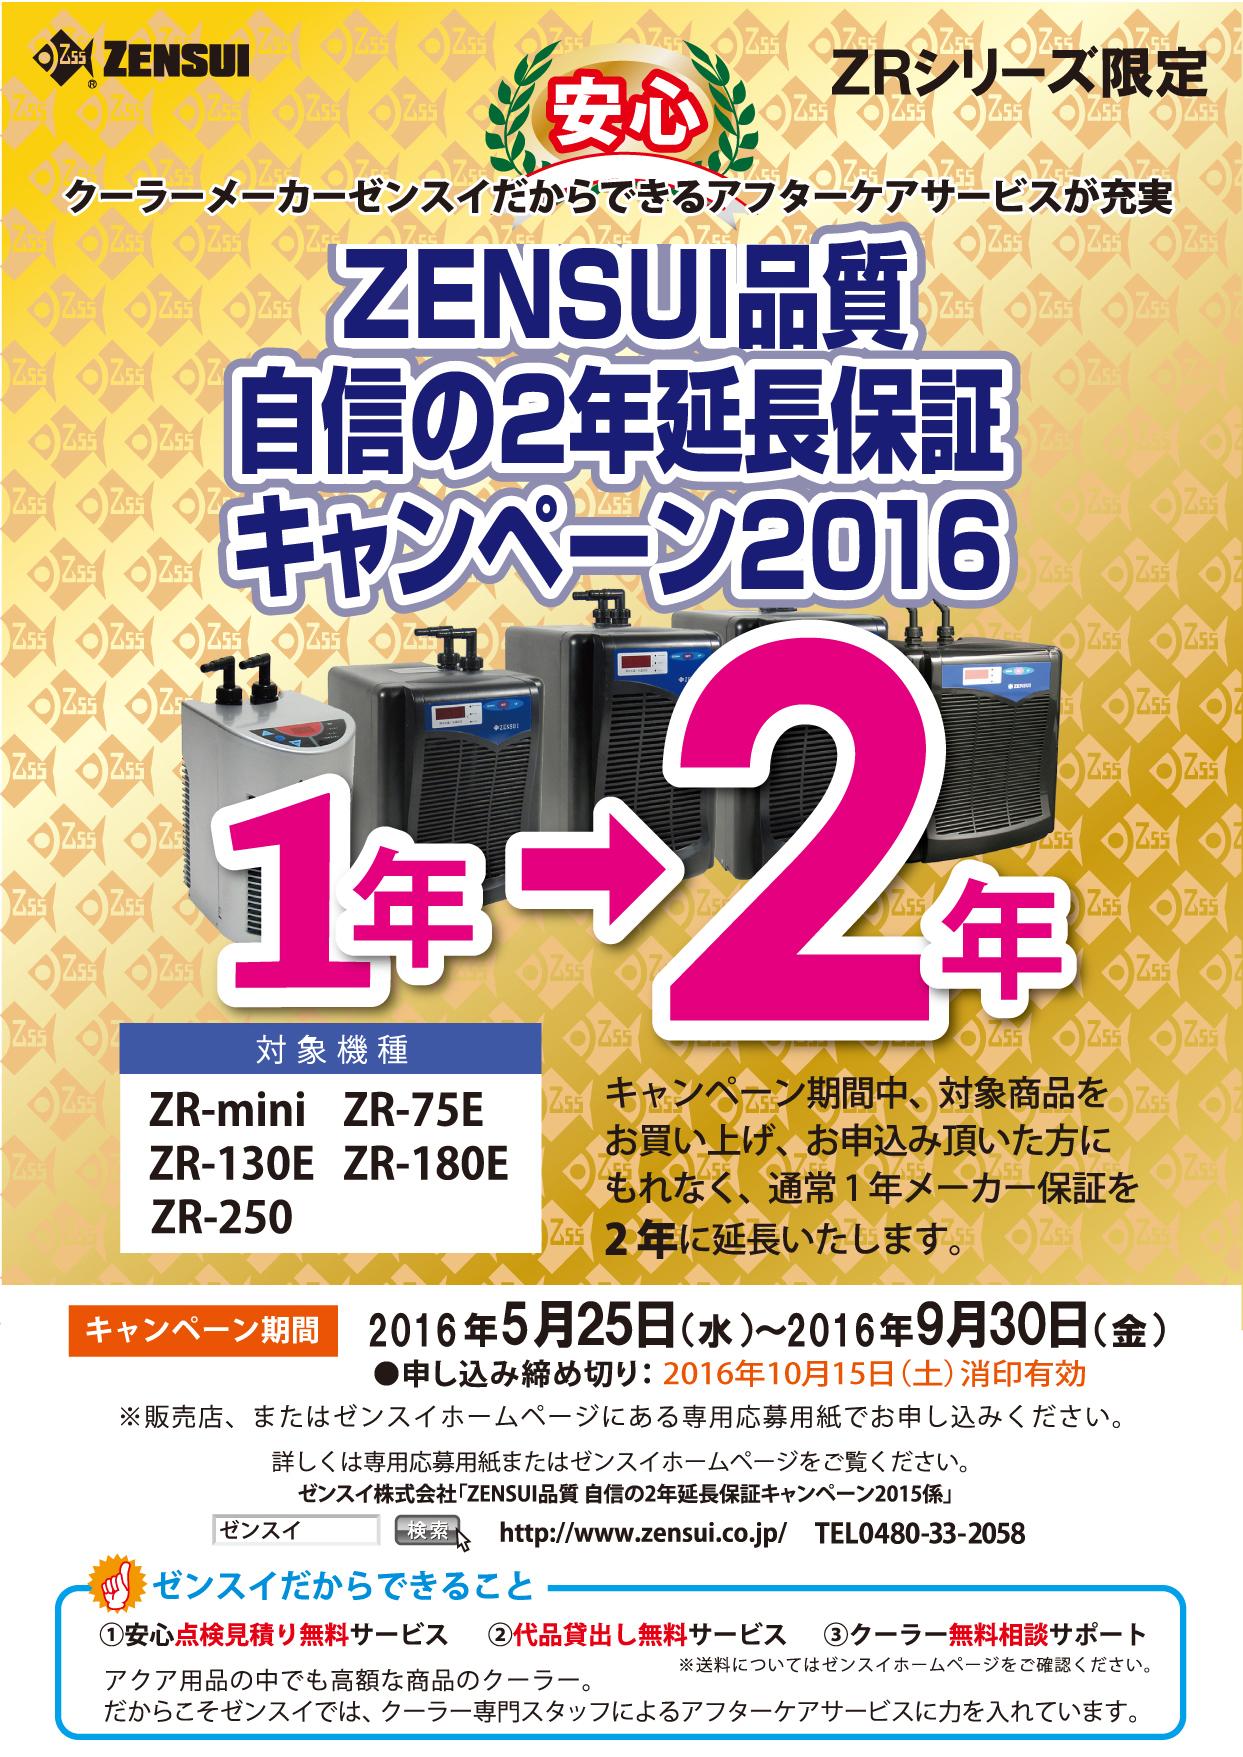 ZRクーラー2年延長保証キャンペーン2016